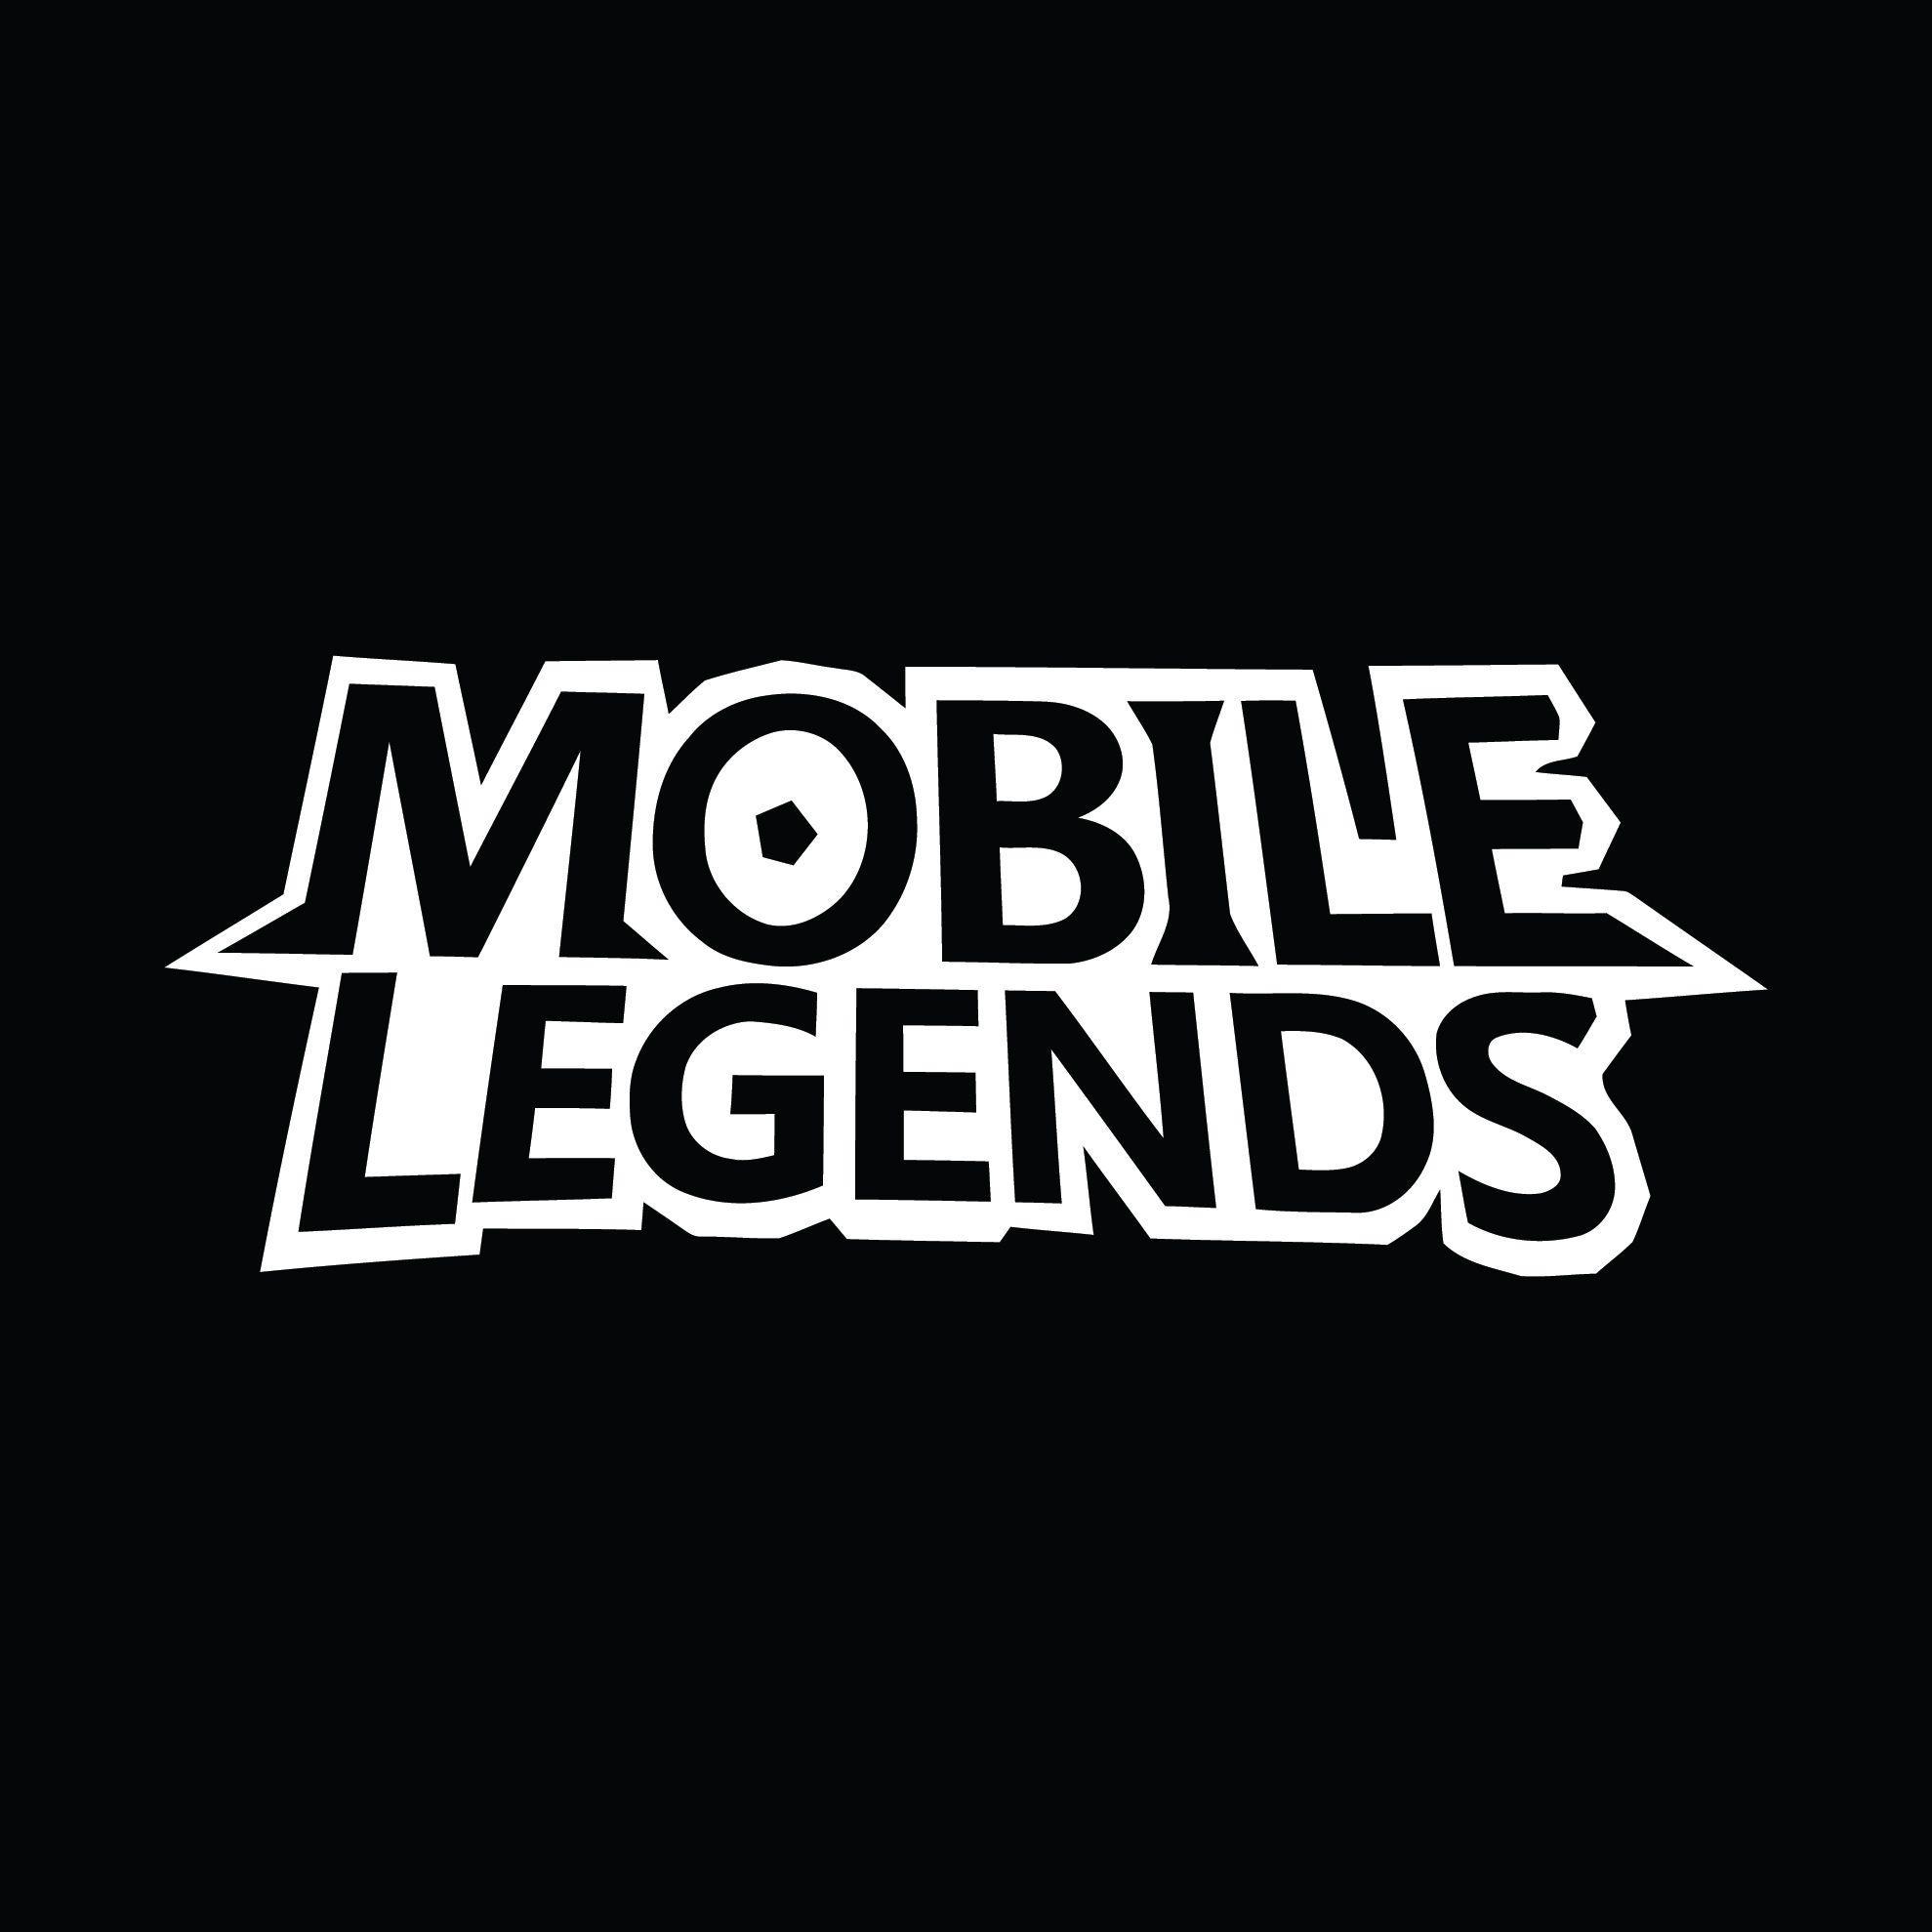 Mobile Legends Logo LogoDix